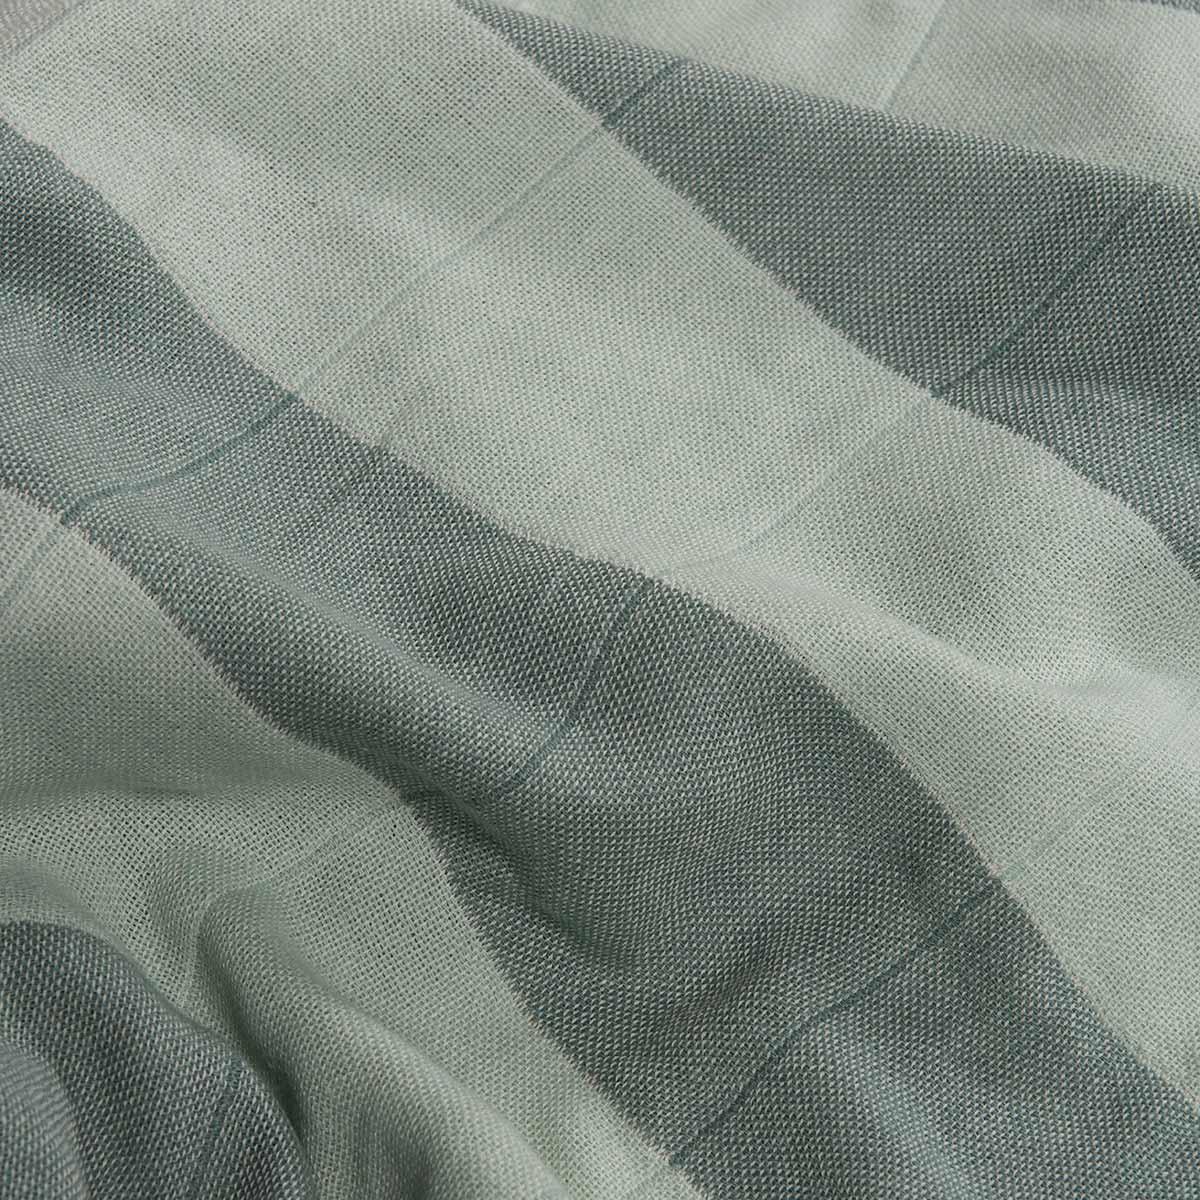 Peshtemal Double - Mint / Almond Green